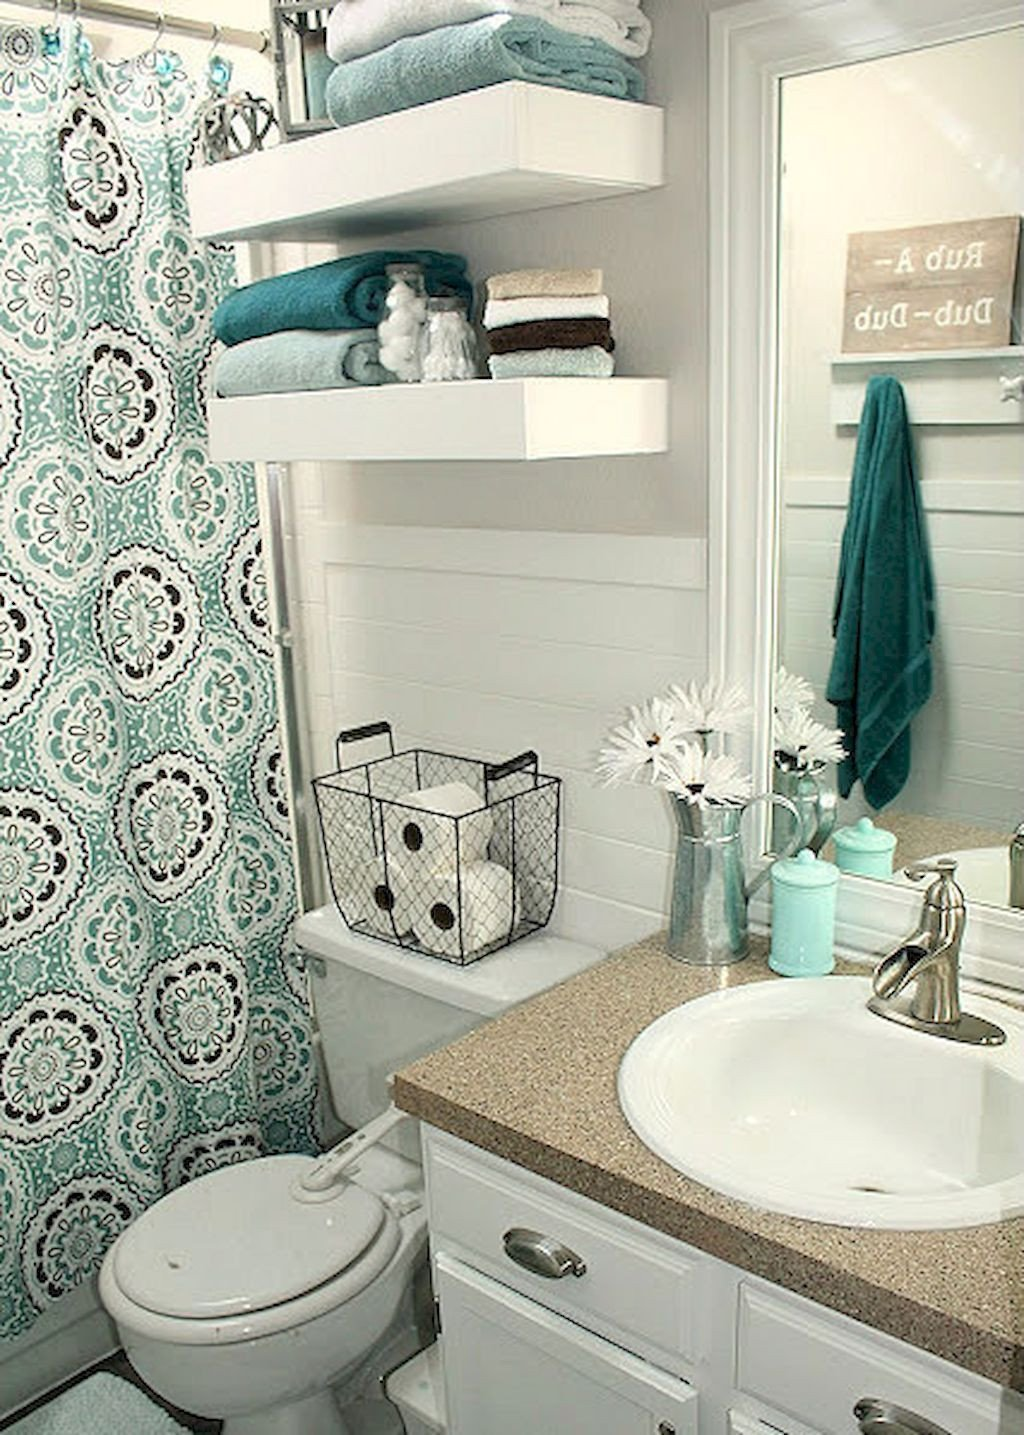 Bathroom Decor On A Budget Luxury Pin by Jennifer Tinsley On Happy Homes